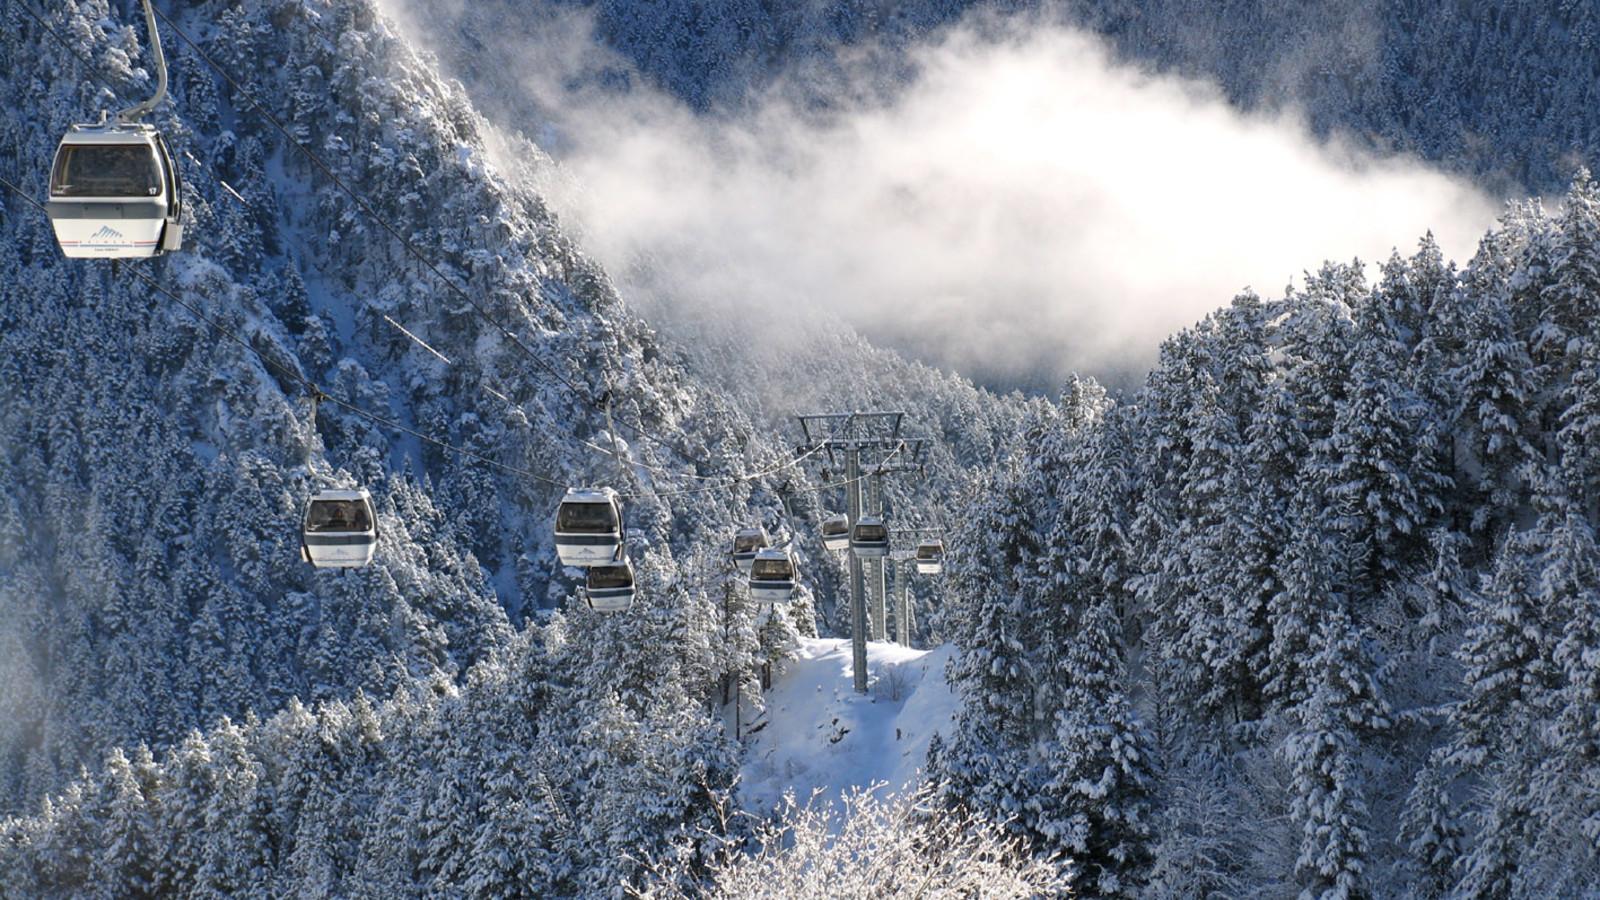 Vallee Blanche, Mont Blanc - Chamonix, Franţa